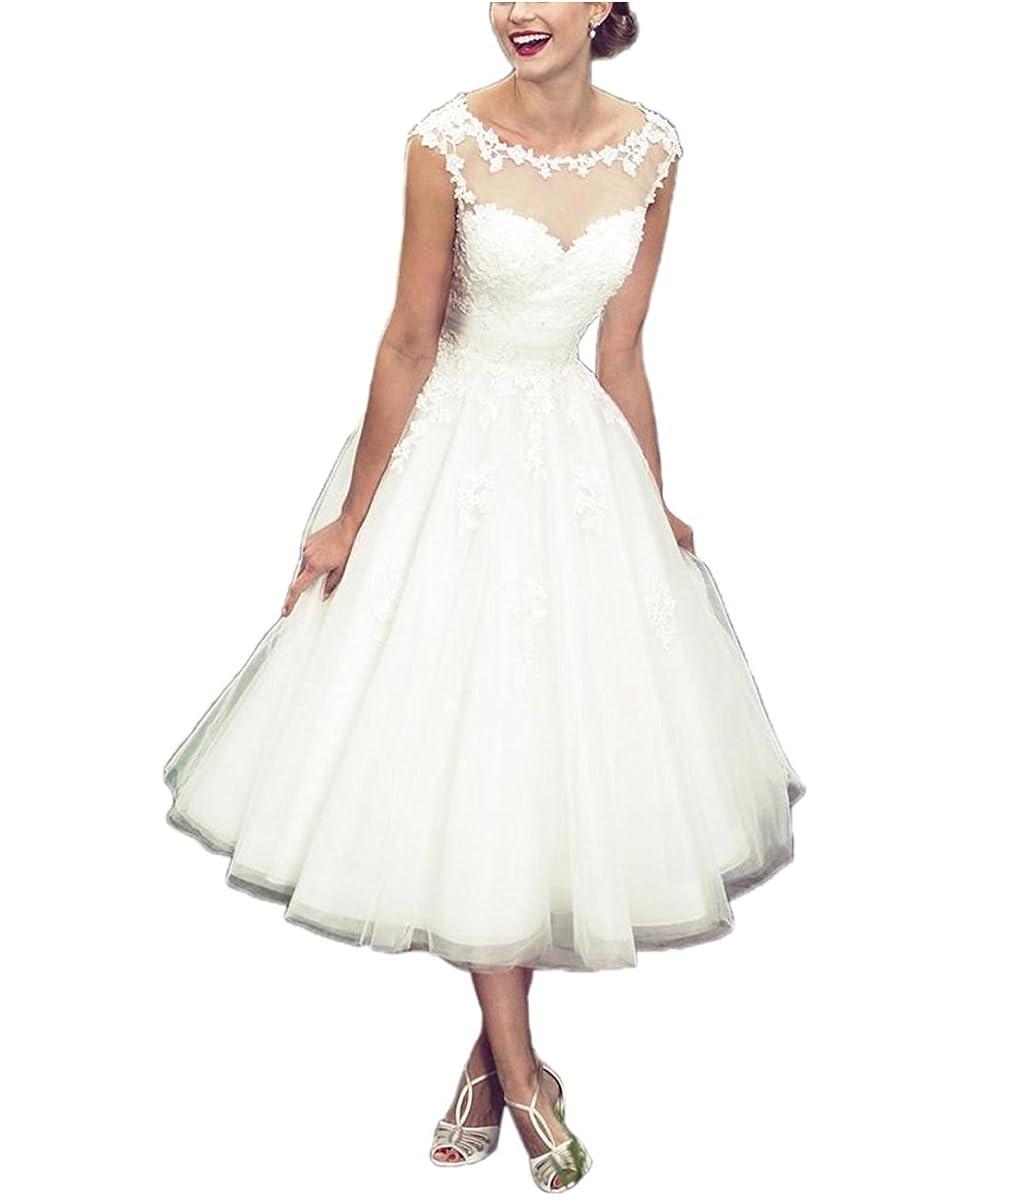 APXPF Women's Elegant Sheer Vintage Tea Length Lace Wedding Dress for Bride